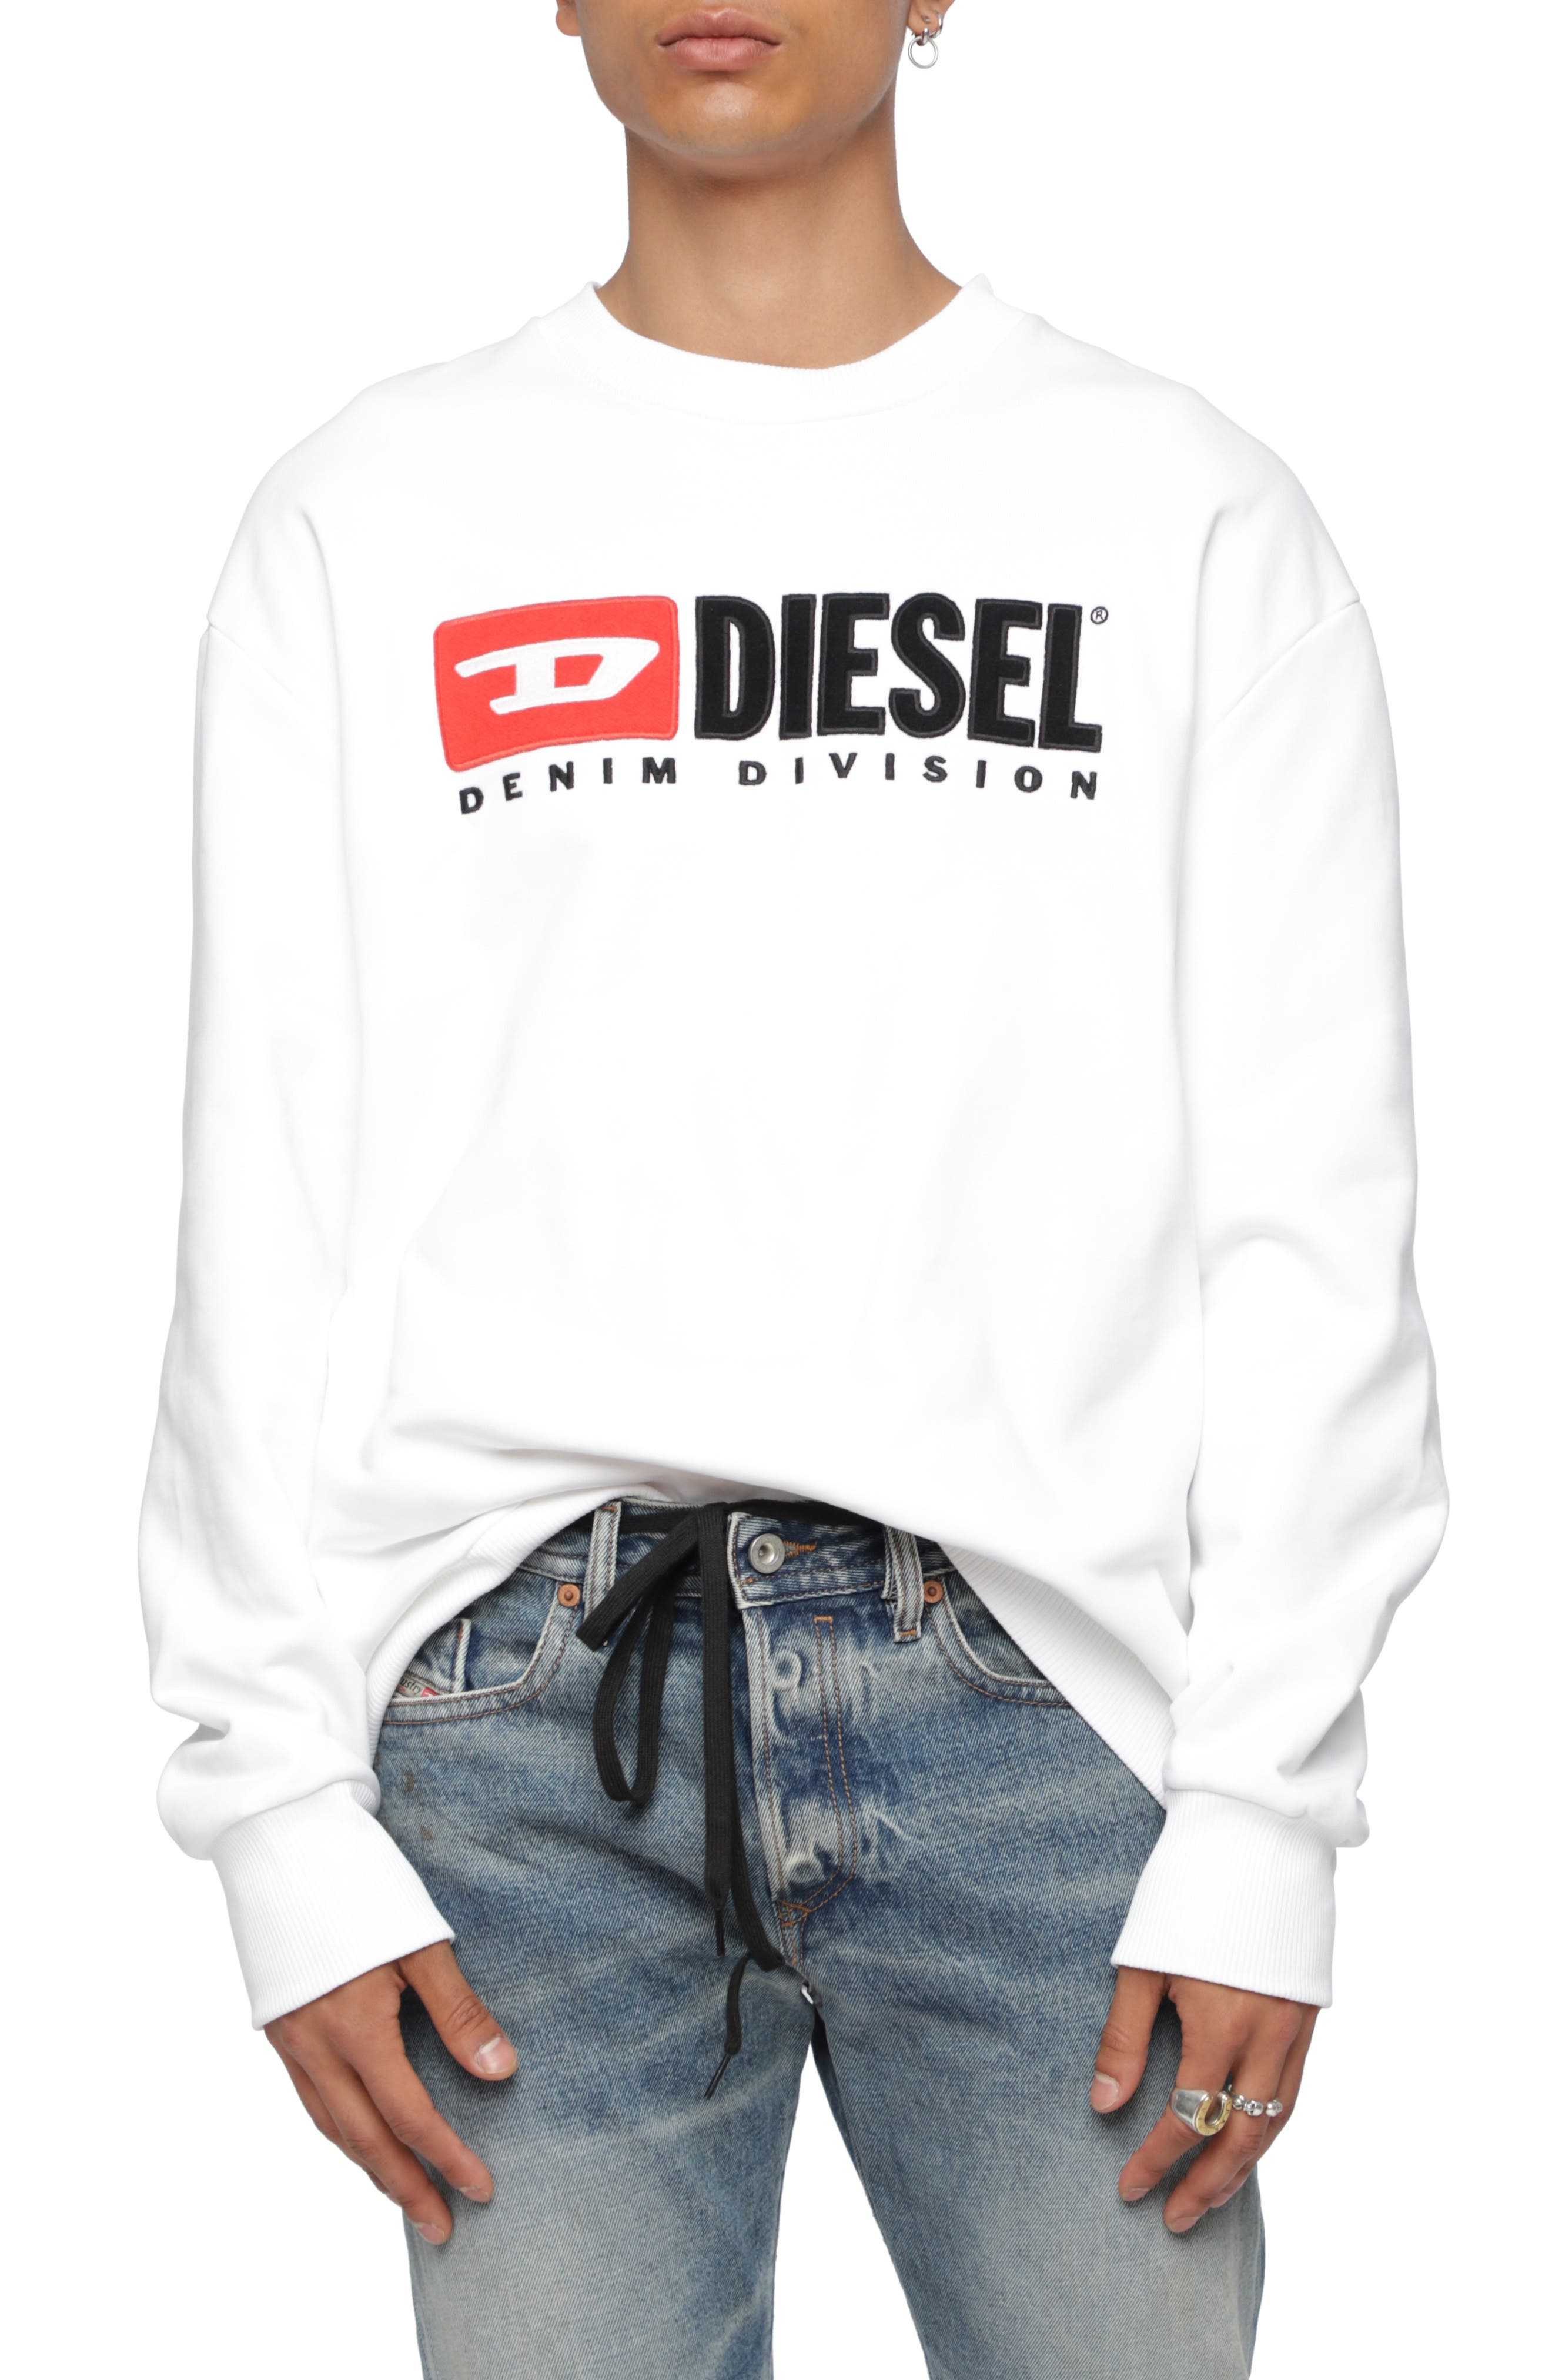 S-CREW-DIVISION Sweatshirt,                             Main thumbnail 1, color,                             WHITE